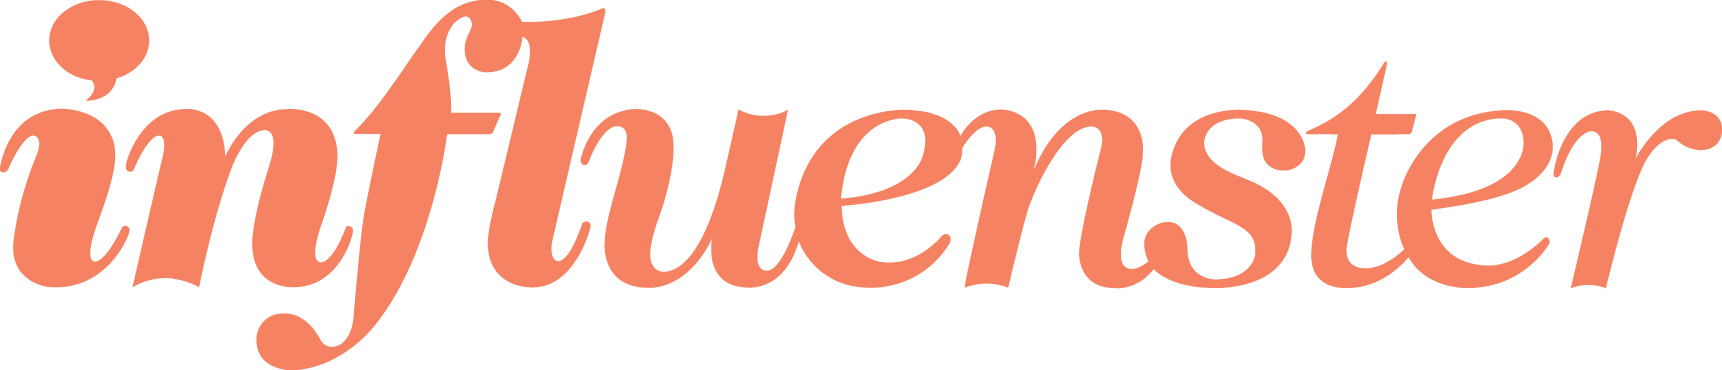 Image result for influenster logo